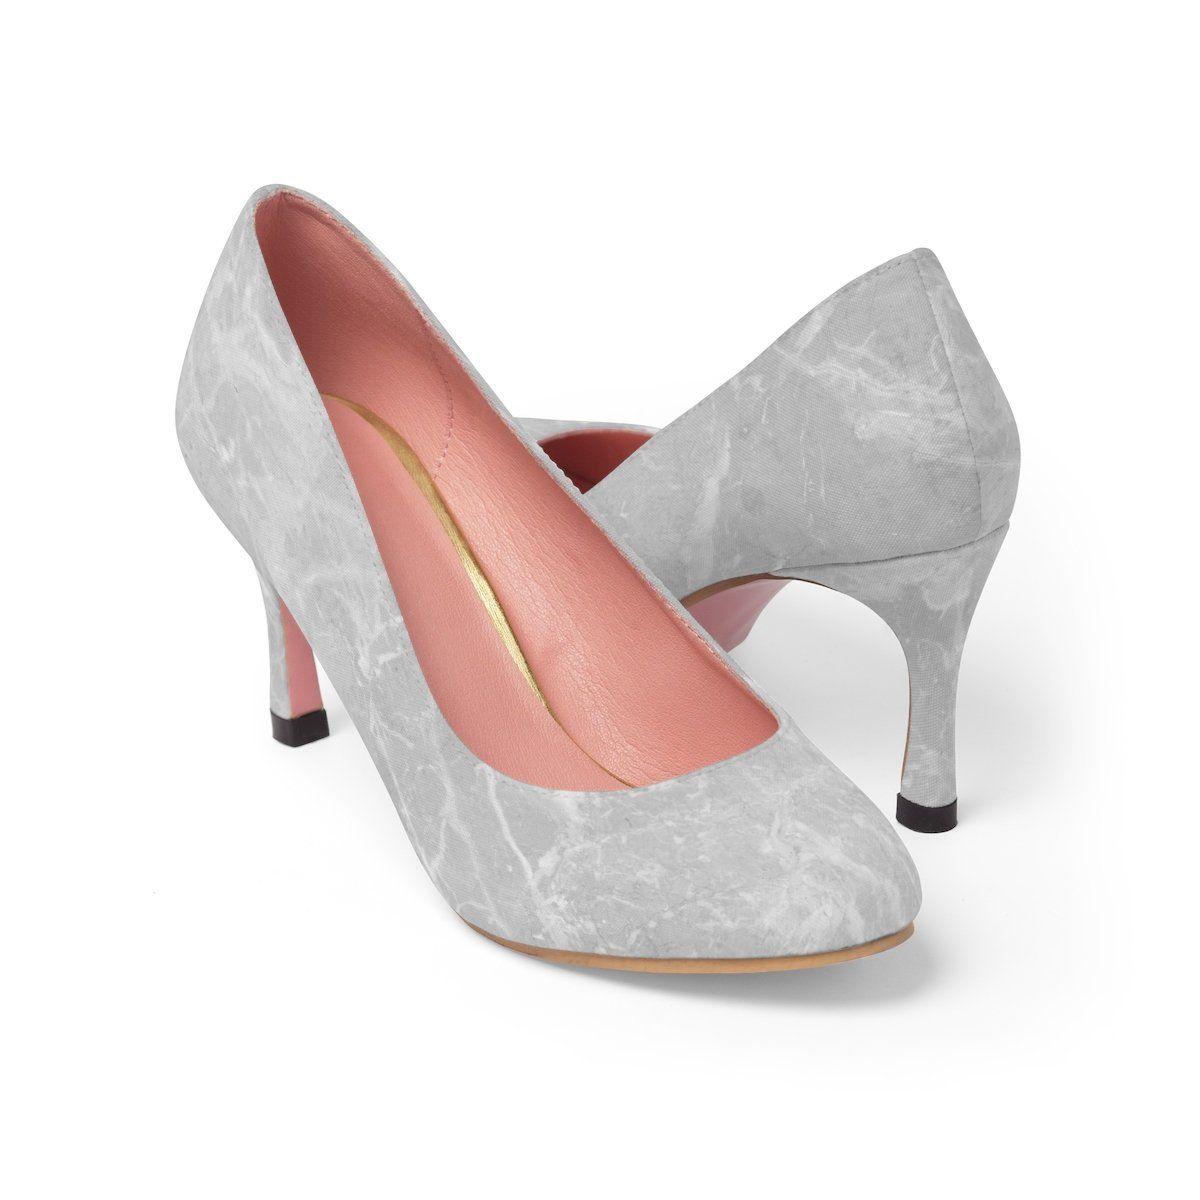 Lace slingbacks with stones   Shoe laces, Fashion shoes